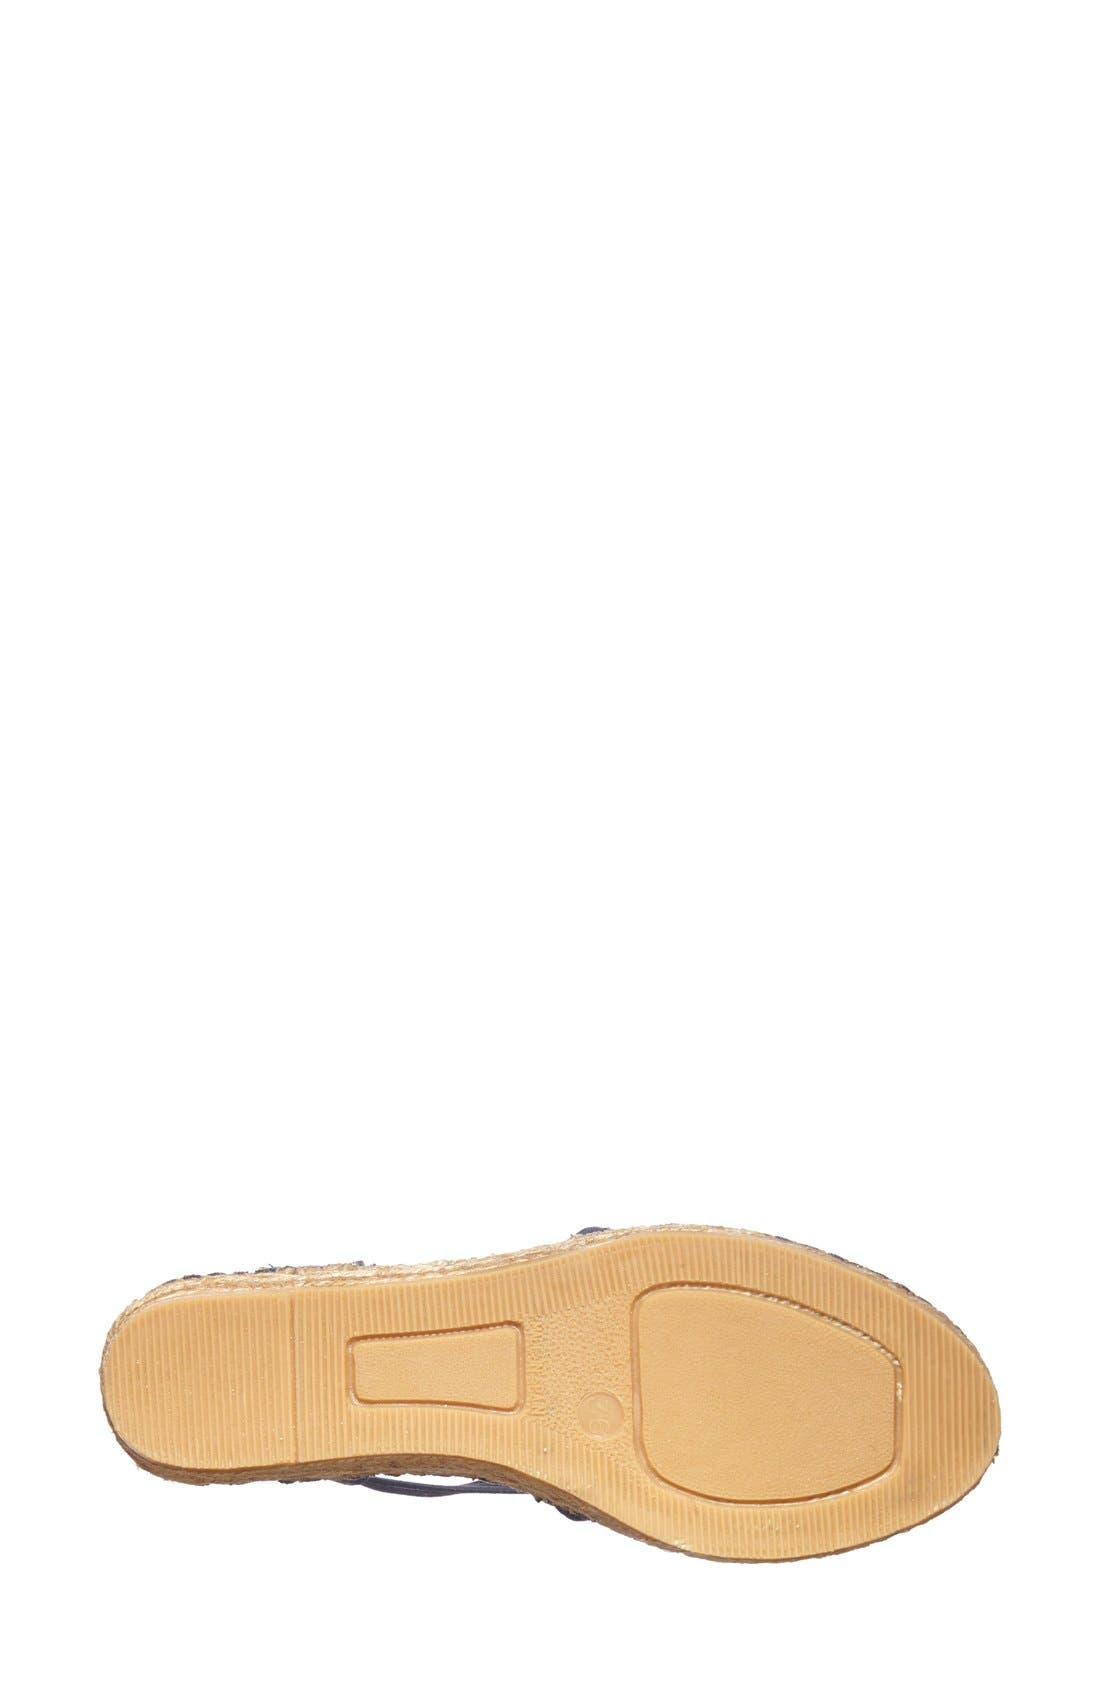 Alternate Image 4  - Toni Pons 'Nantes' Silk Stripe Sandal (Women)